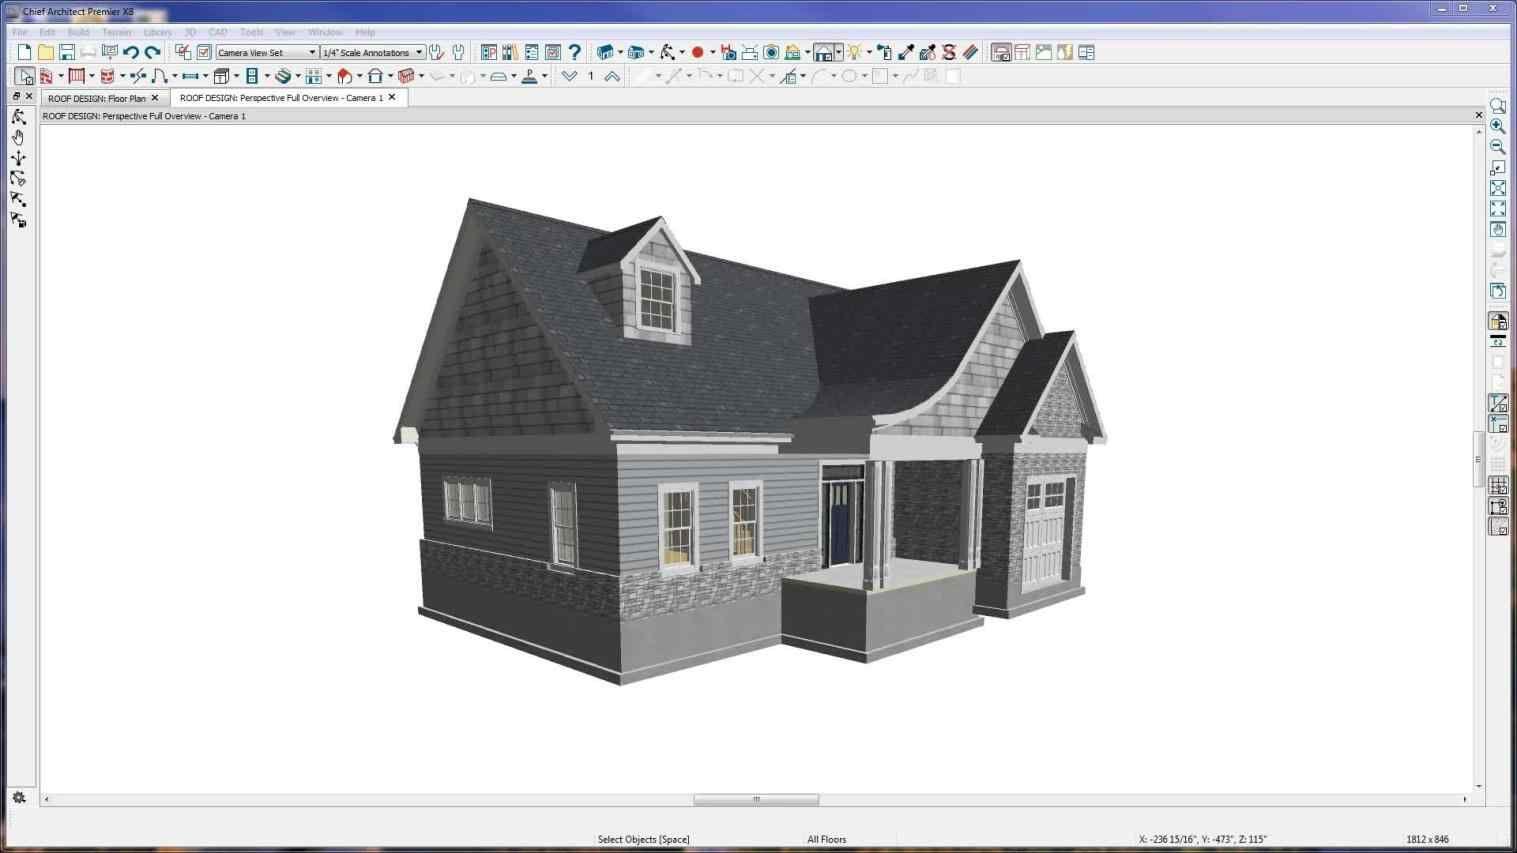 Dutch Gable Roof Designs | Gable roof design, Roof design ...